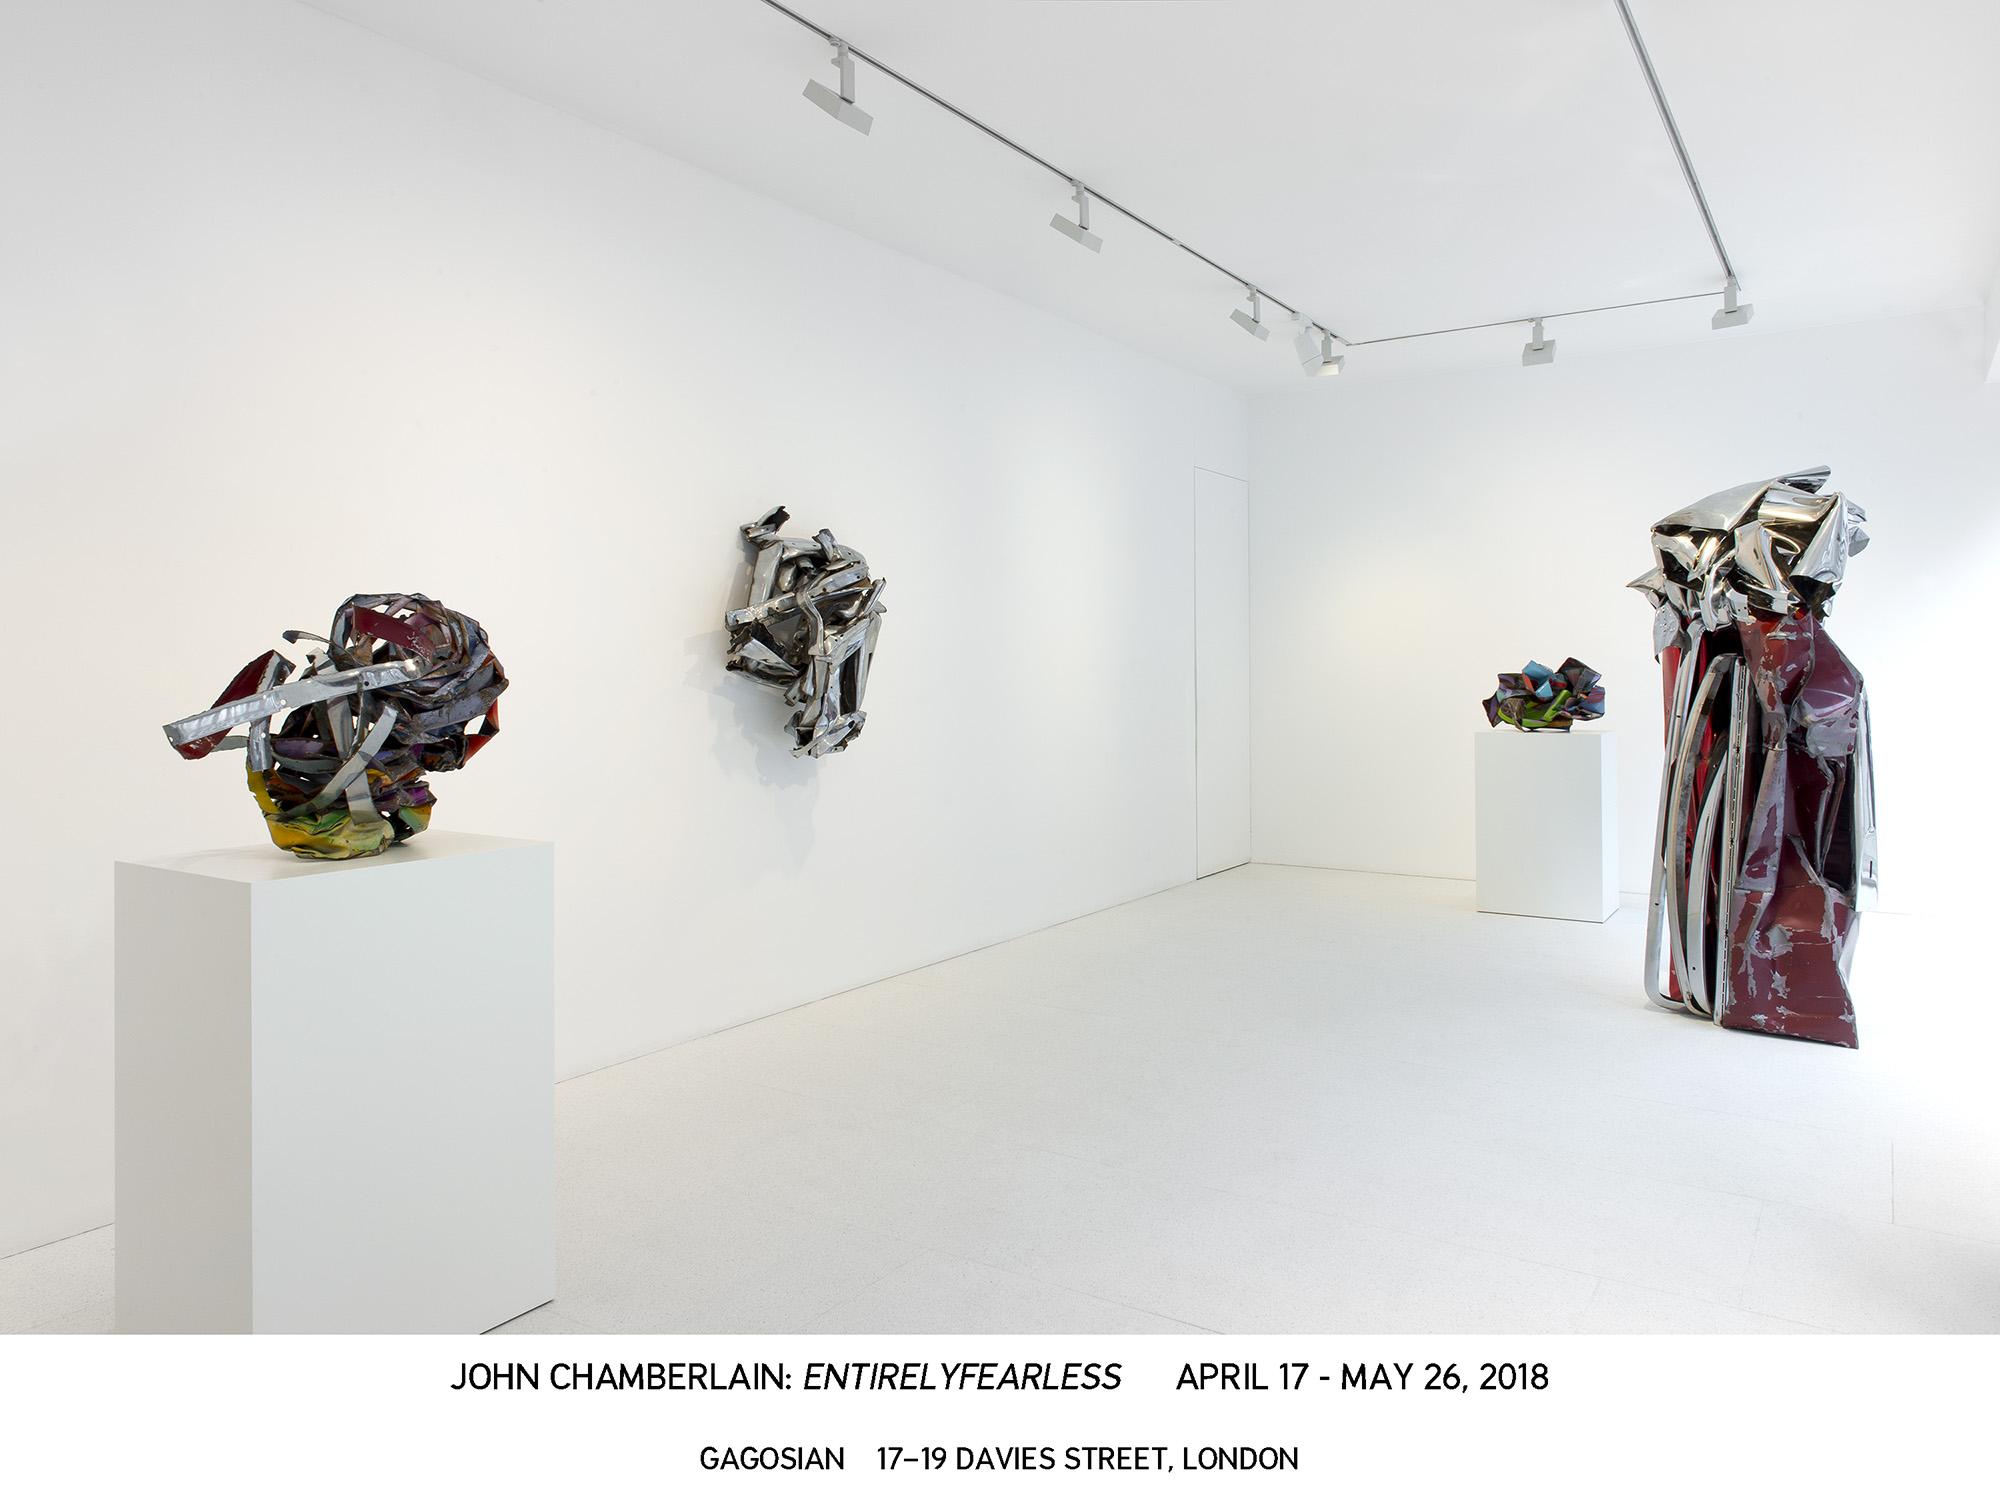 CHAMBERLAIN 2018 ENTIRELYFEARLESS Installation view 2.jpg